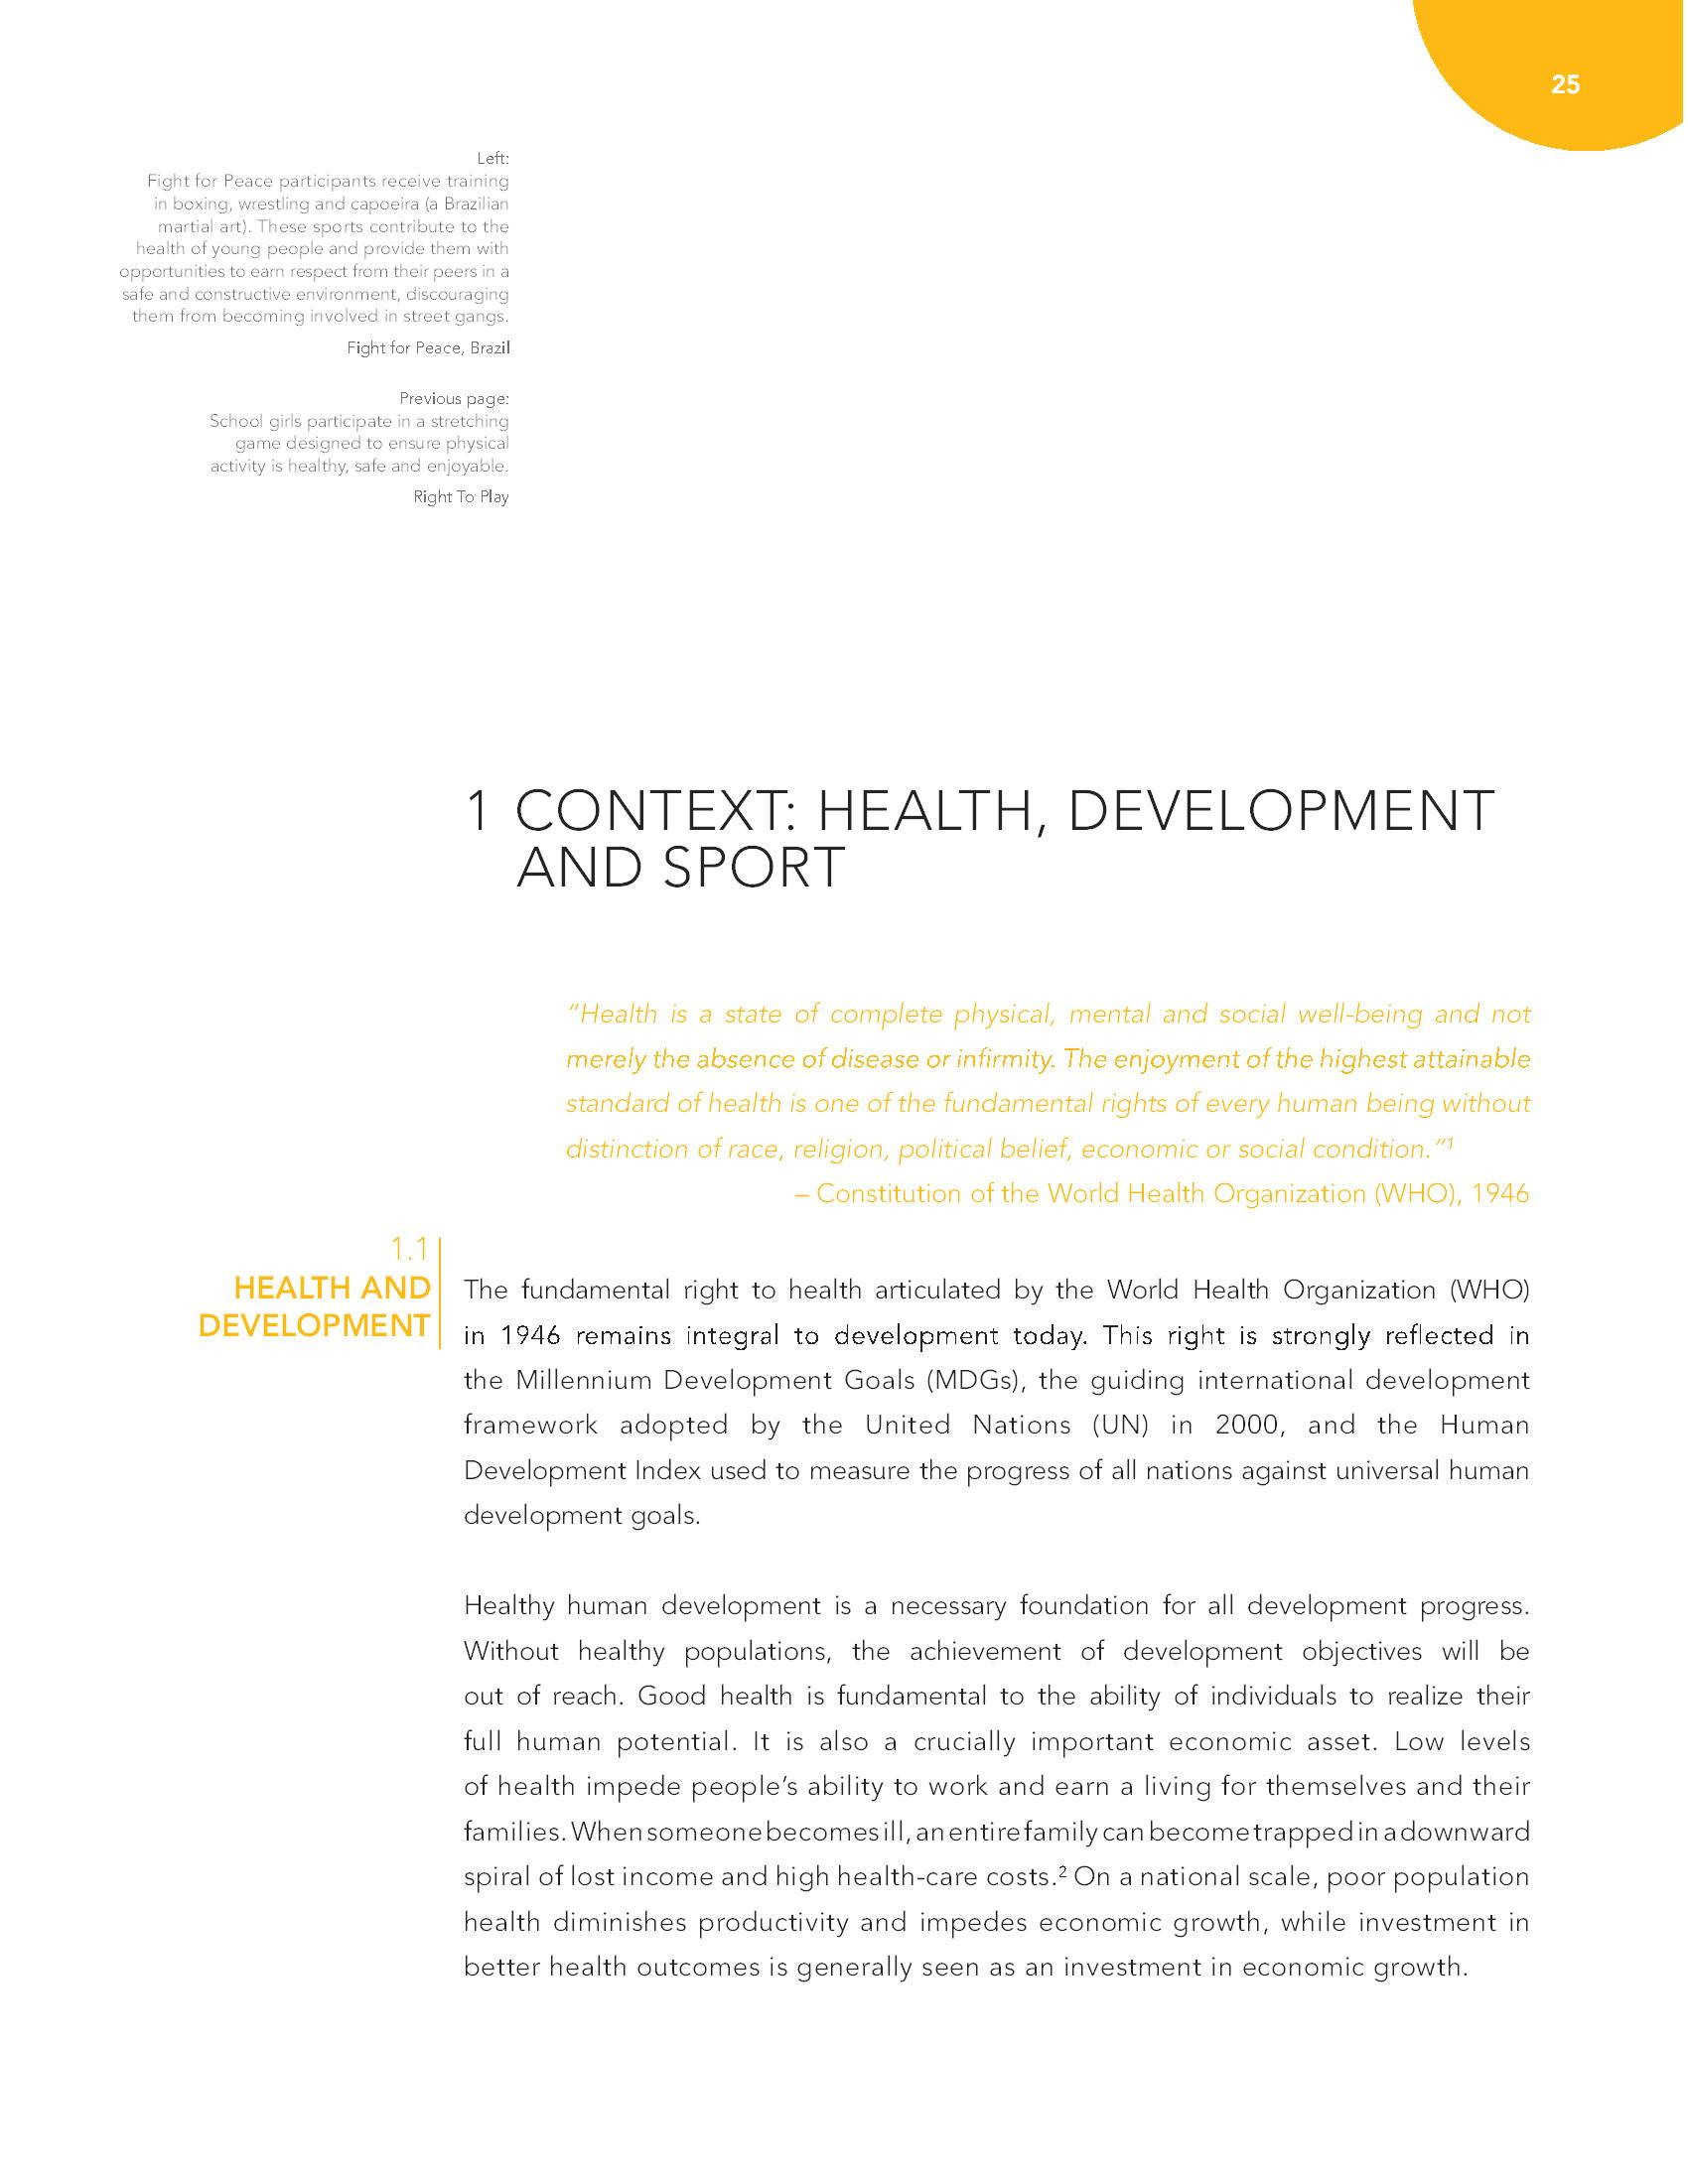 HEALTH, DEVELOPMENT 52